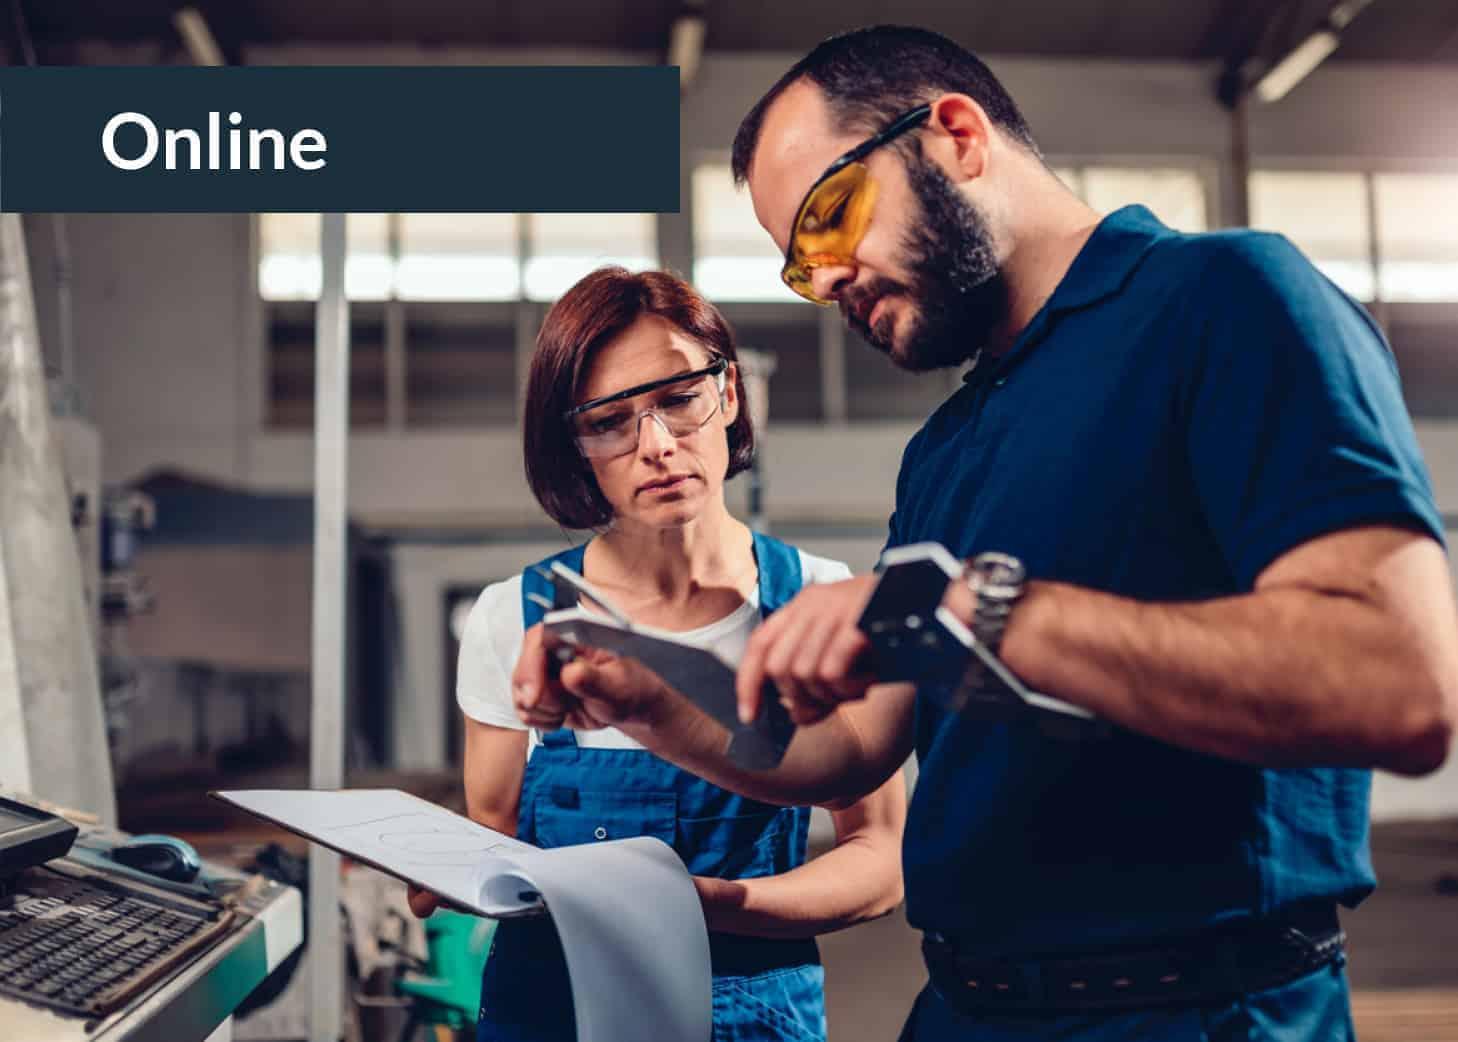 TWI Jobinstruktion – Kursus Online